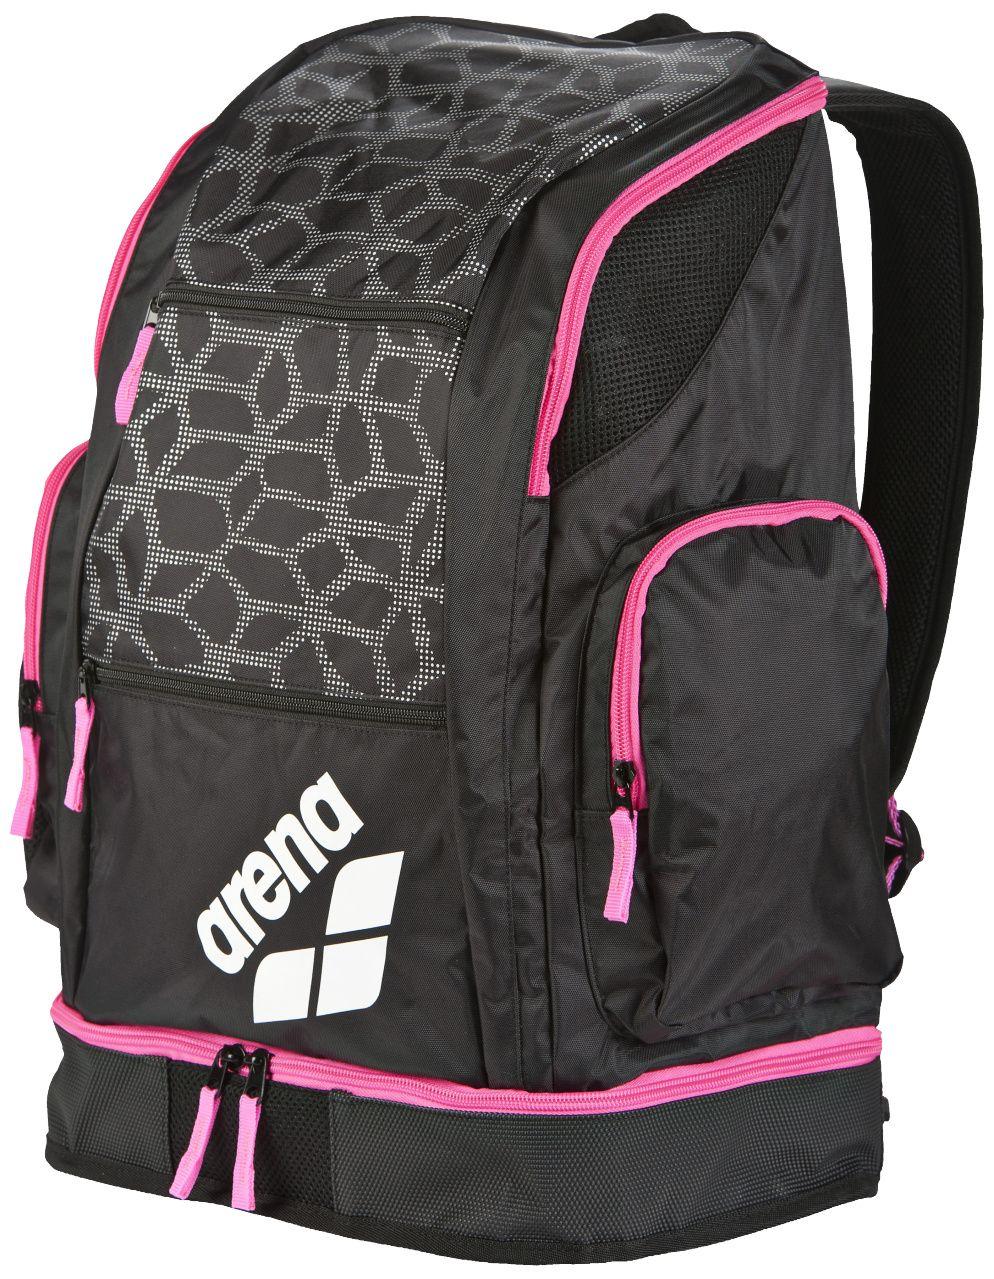 0aa03adb72 Spiky 2 Large Backpack